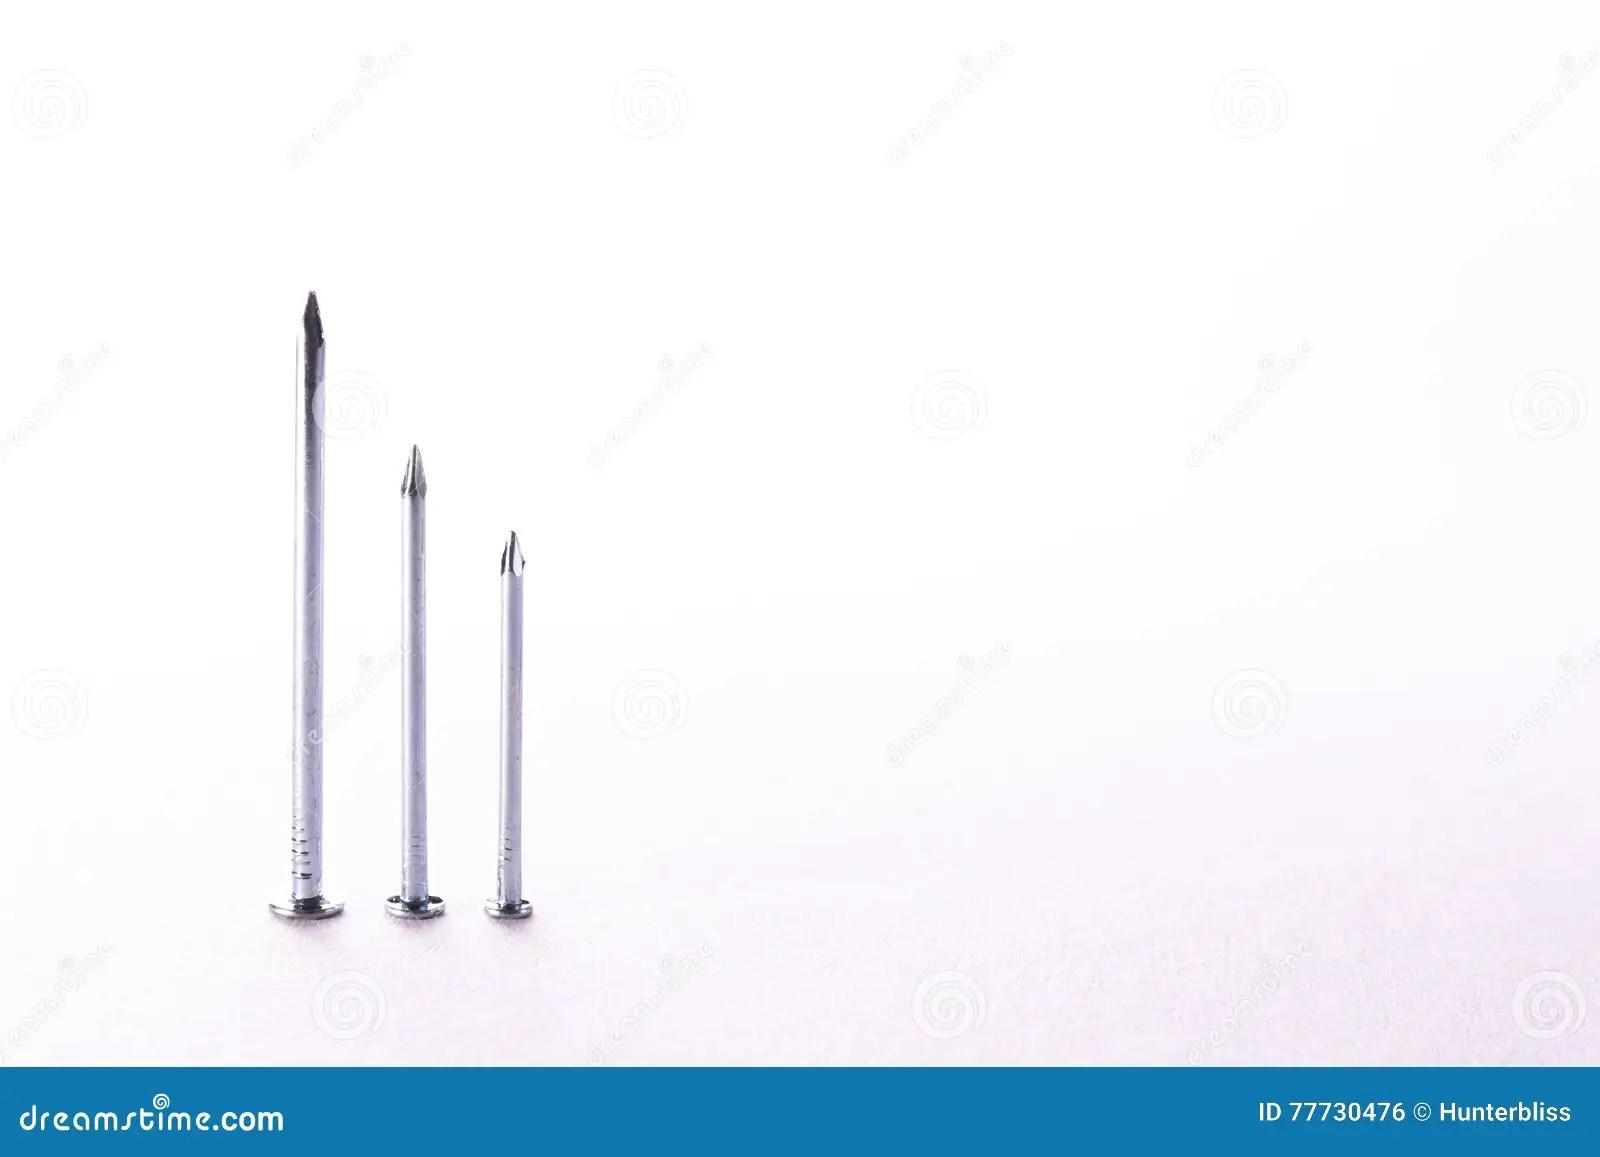 Chrome Metal Nails Decreasing Bar Graph Construction White